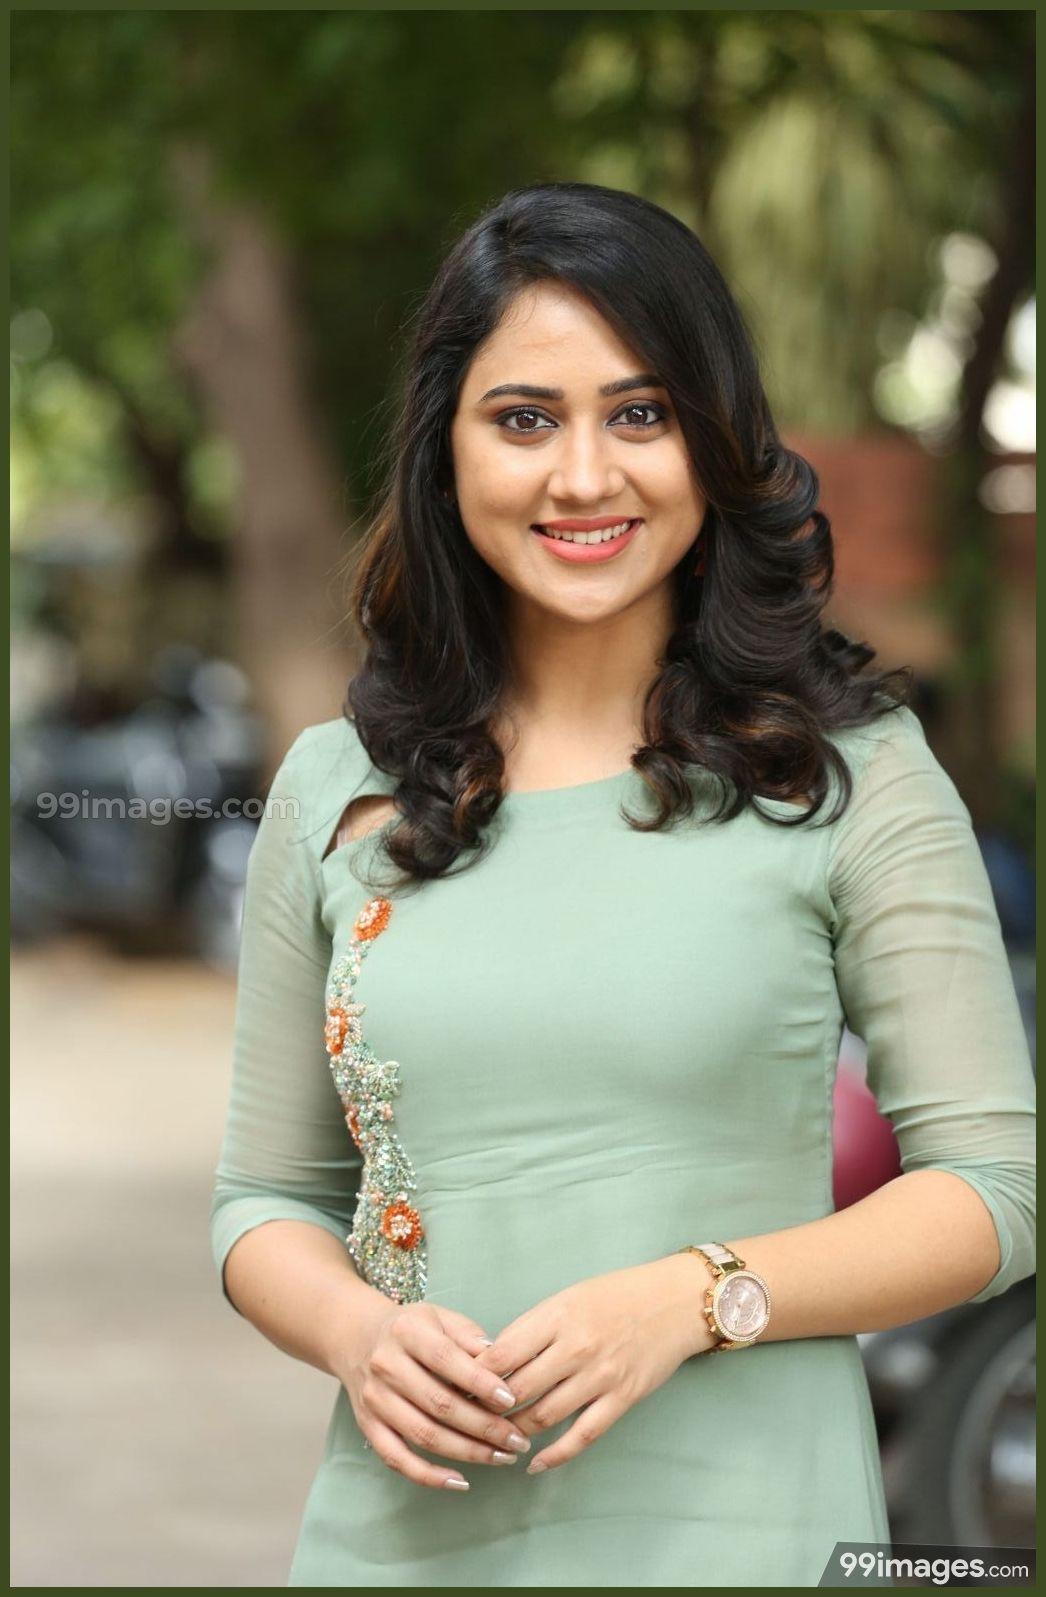 24+ Beautiful South Indian Actress Hd Wallpapers 1080P